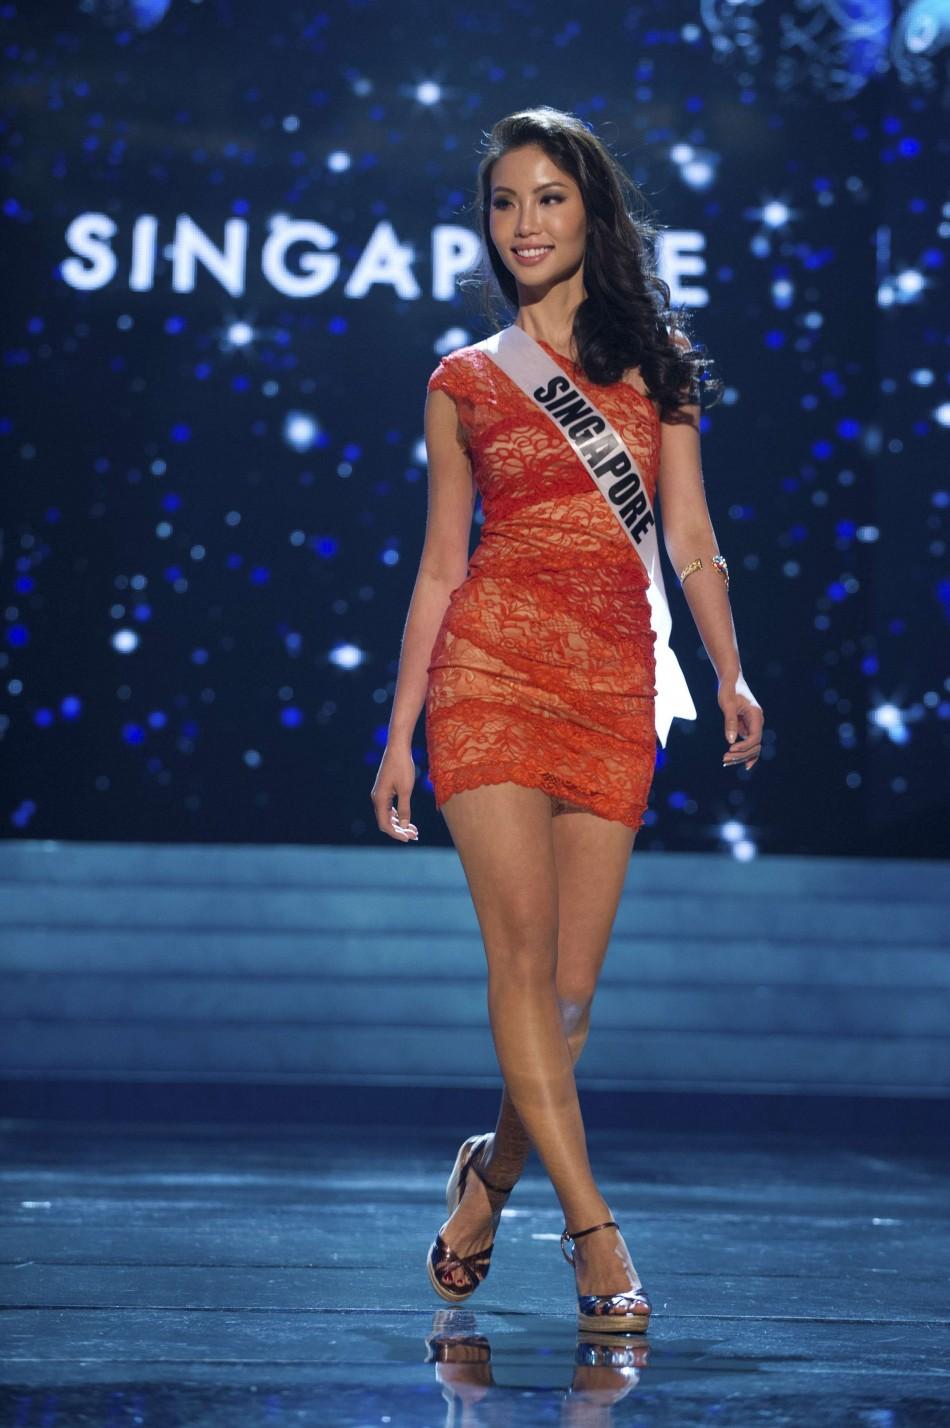 Miss Singapore, Lynn Tan